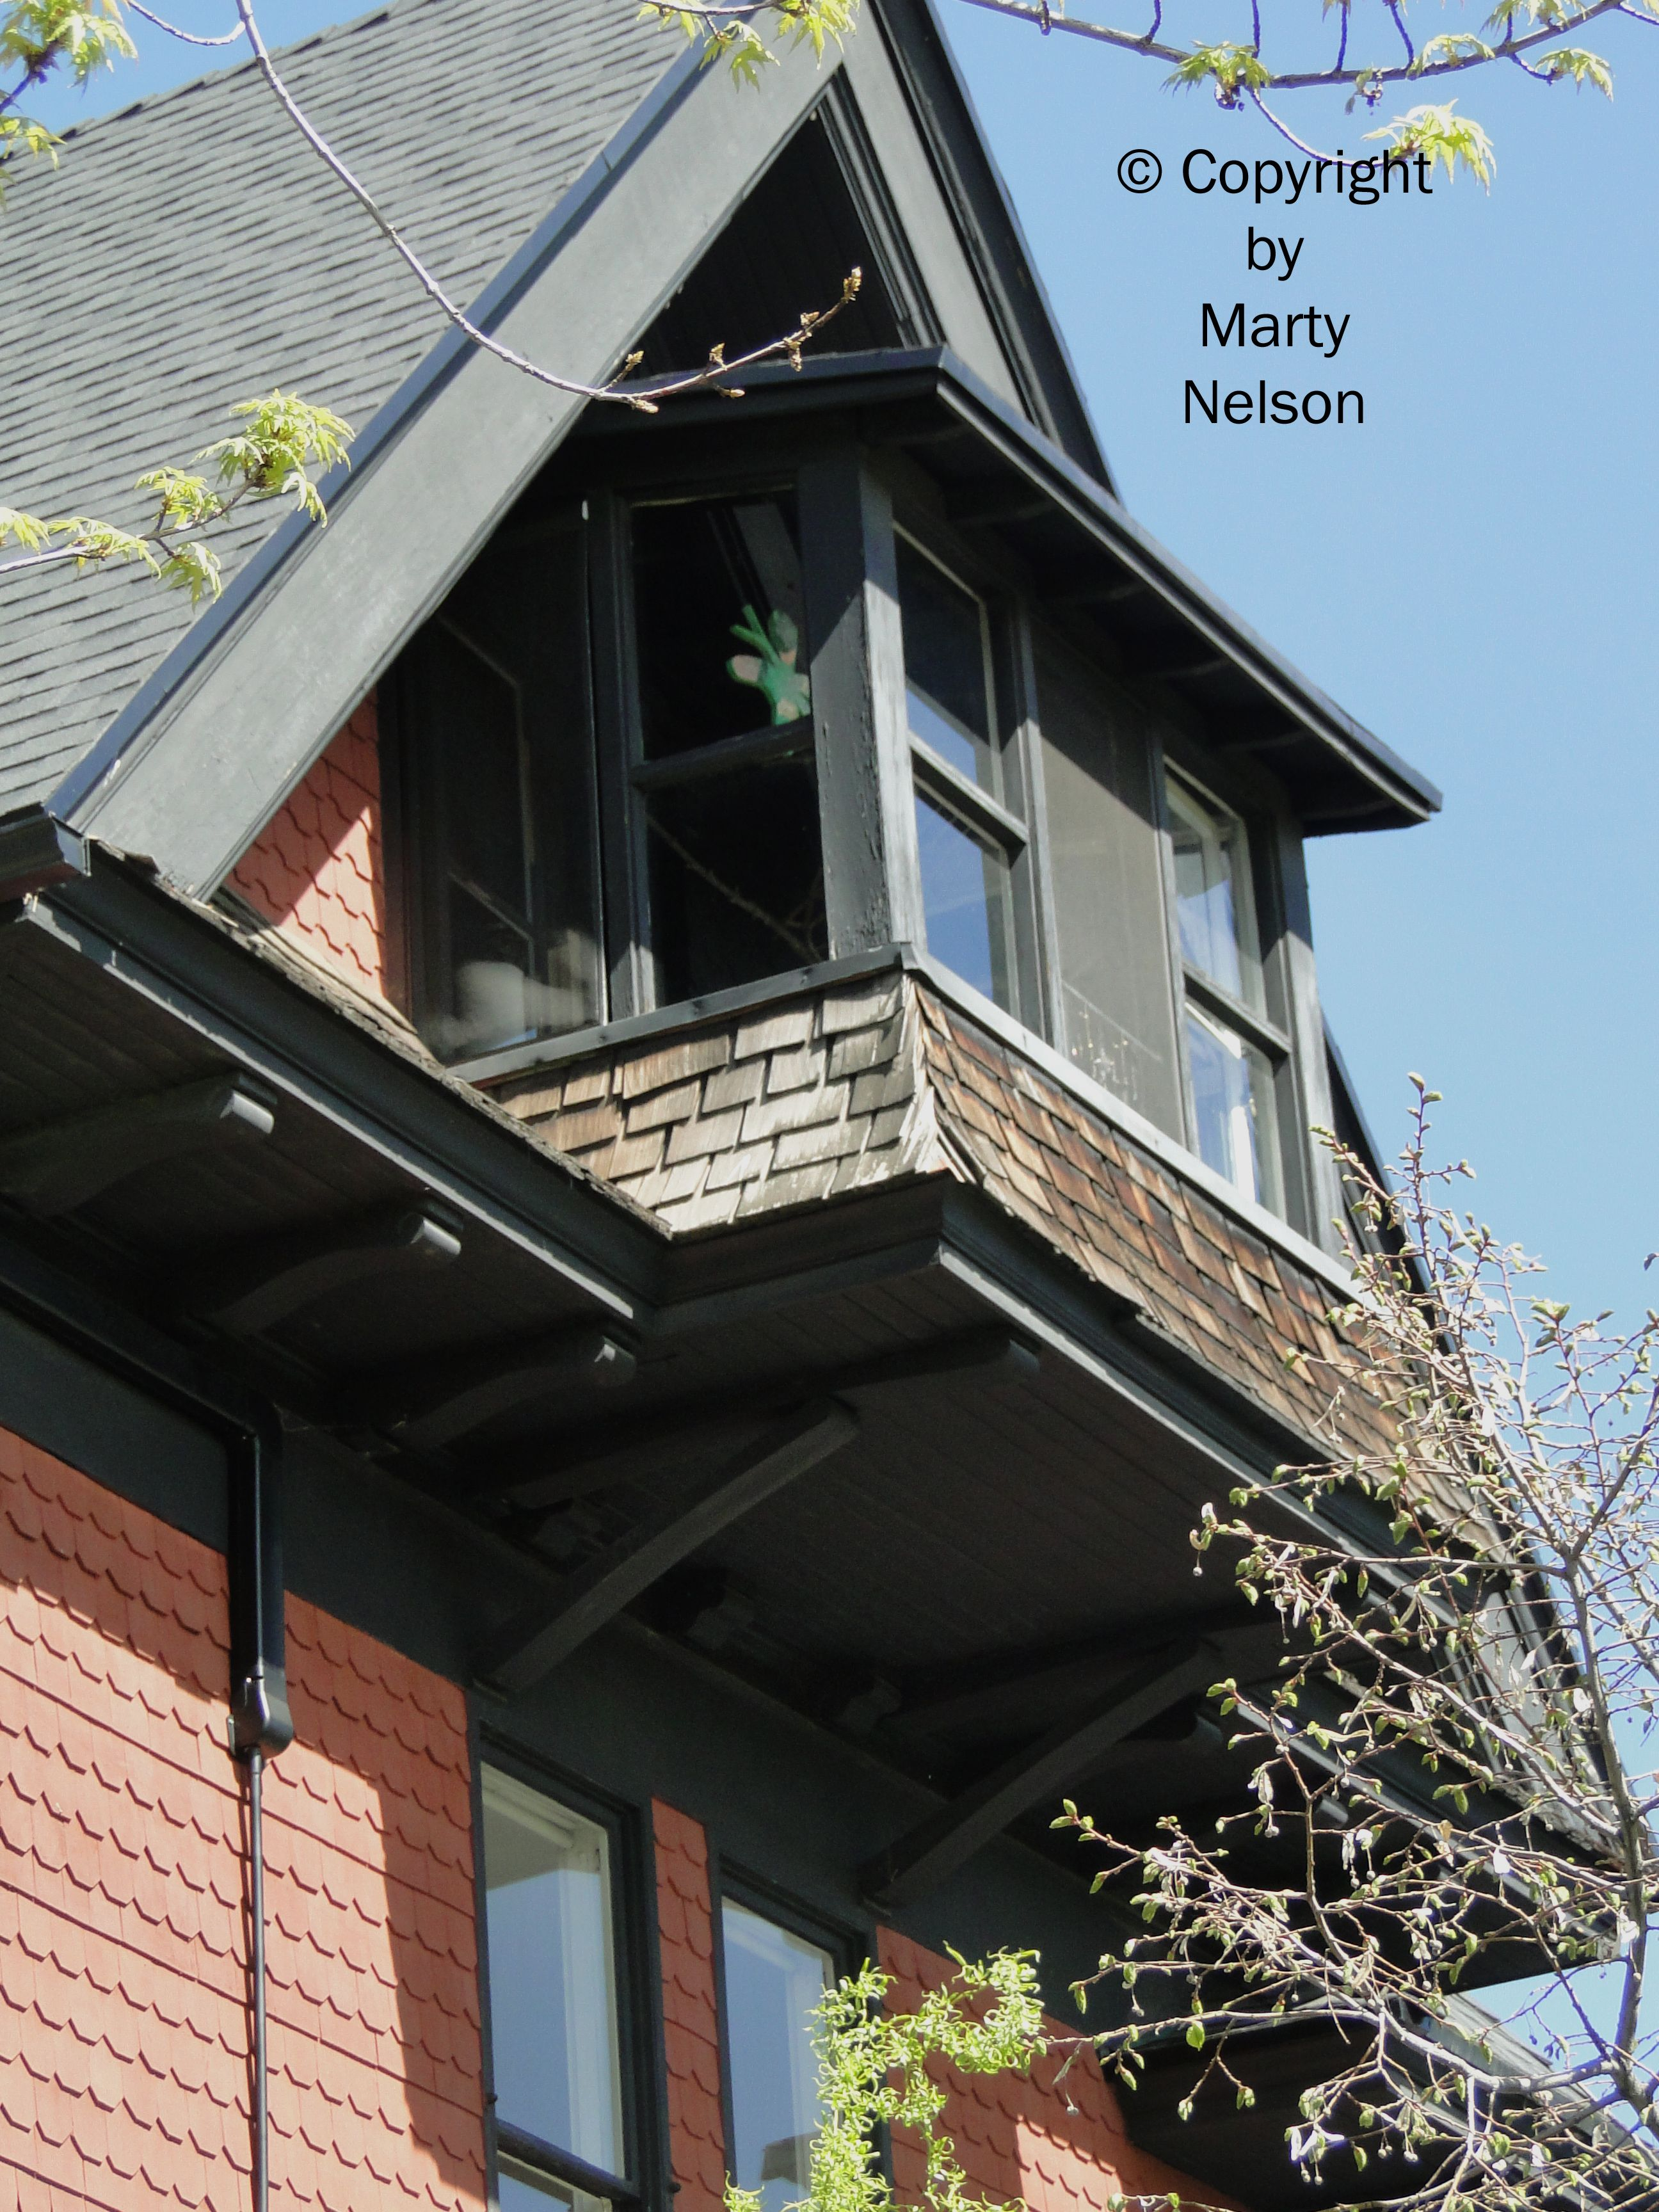 Pin by Marty Nelson on Boise Landmark Buildings